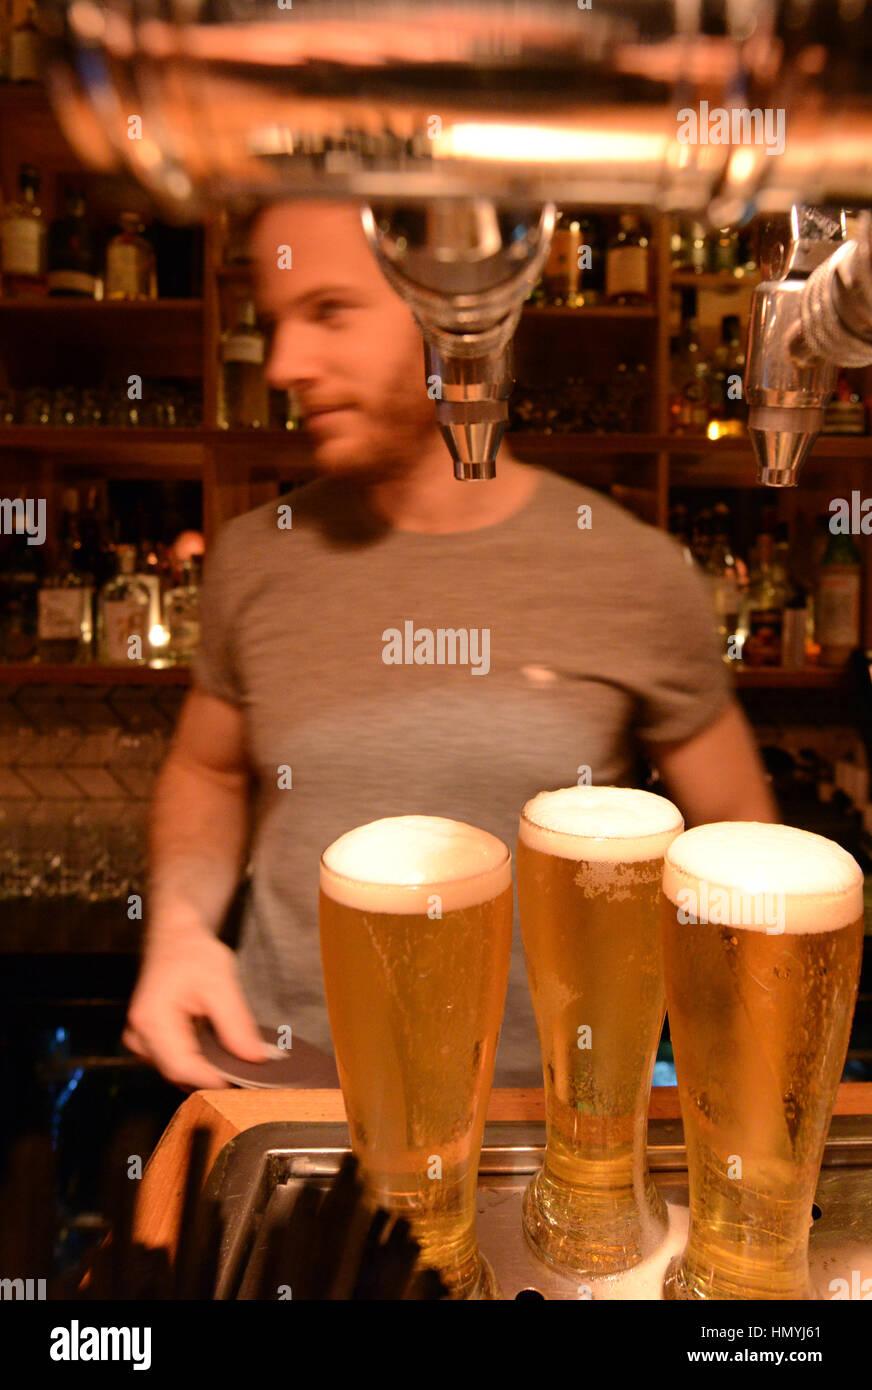 Die trendige coole Udaberri Pintxos Y Vino Bar in Adelaide, Australien. Stockbild